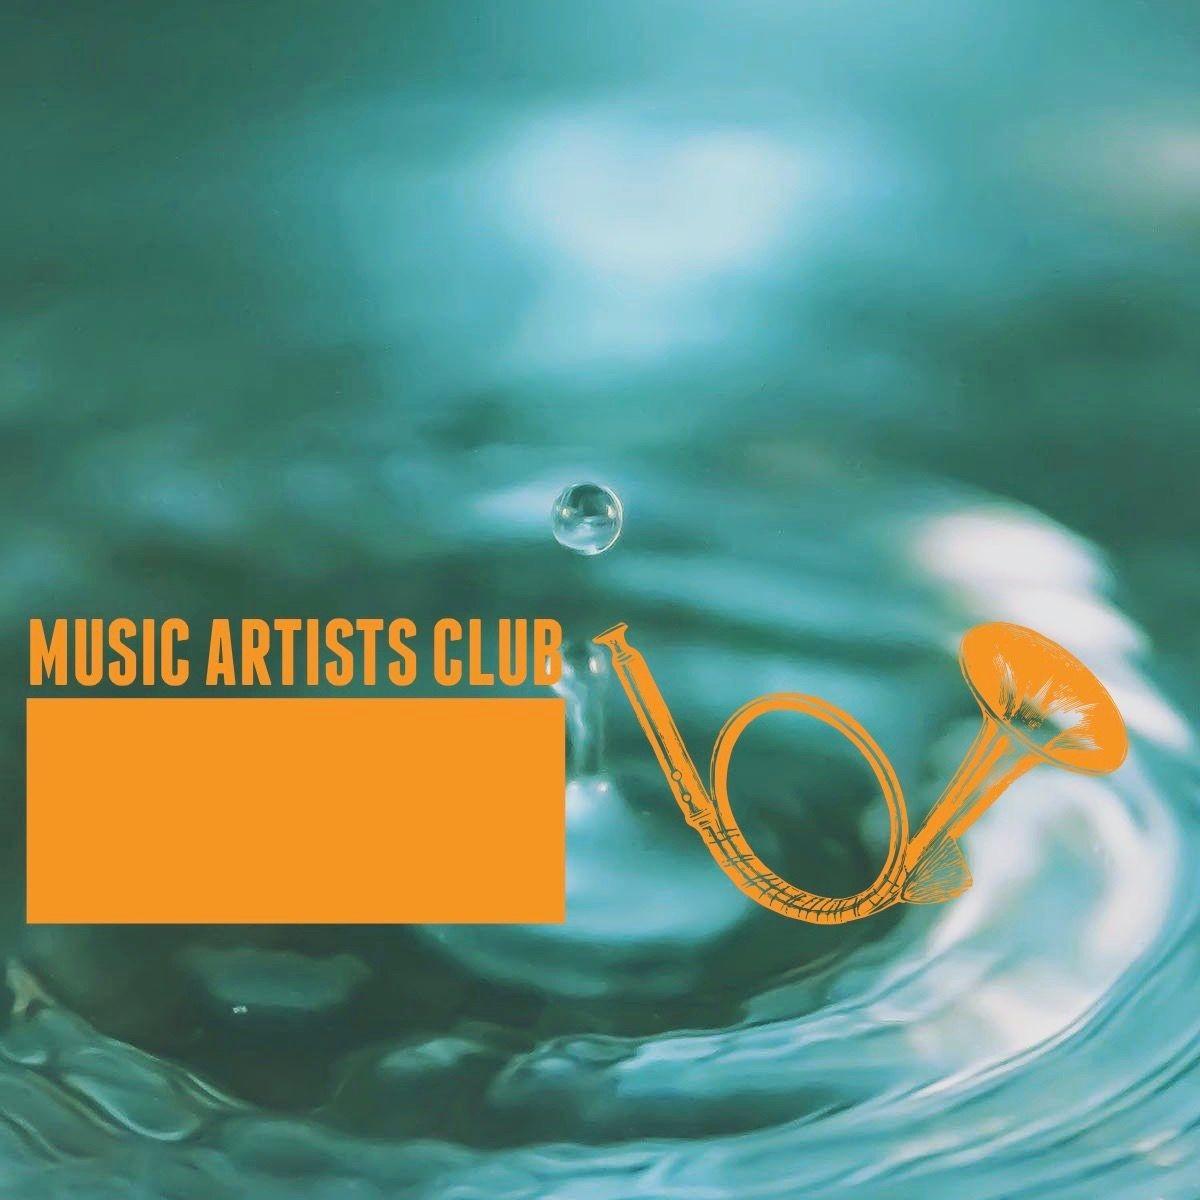 Music Artists Club Logo